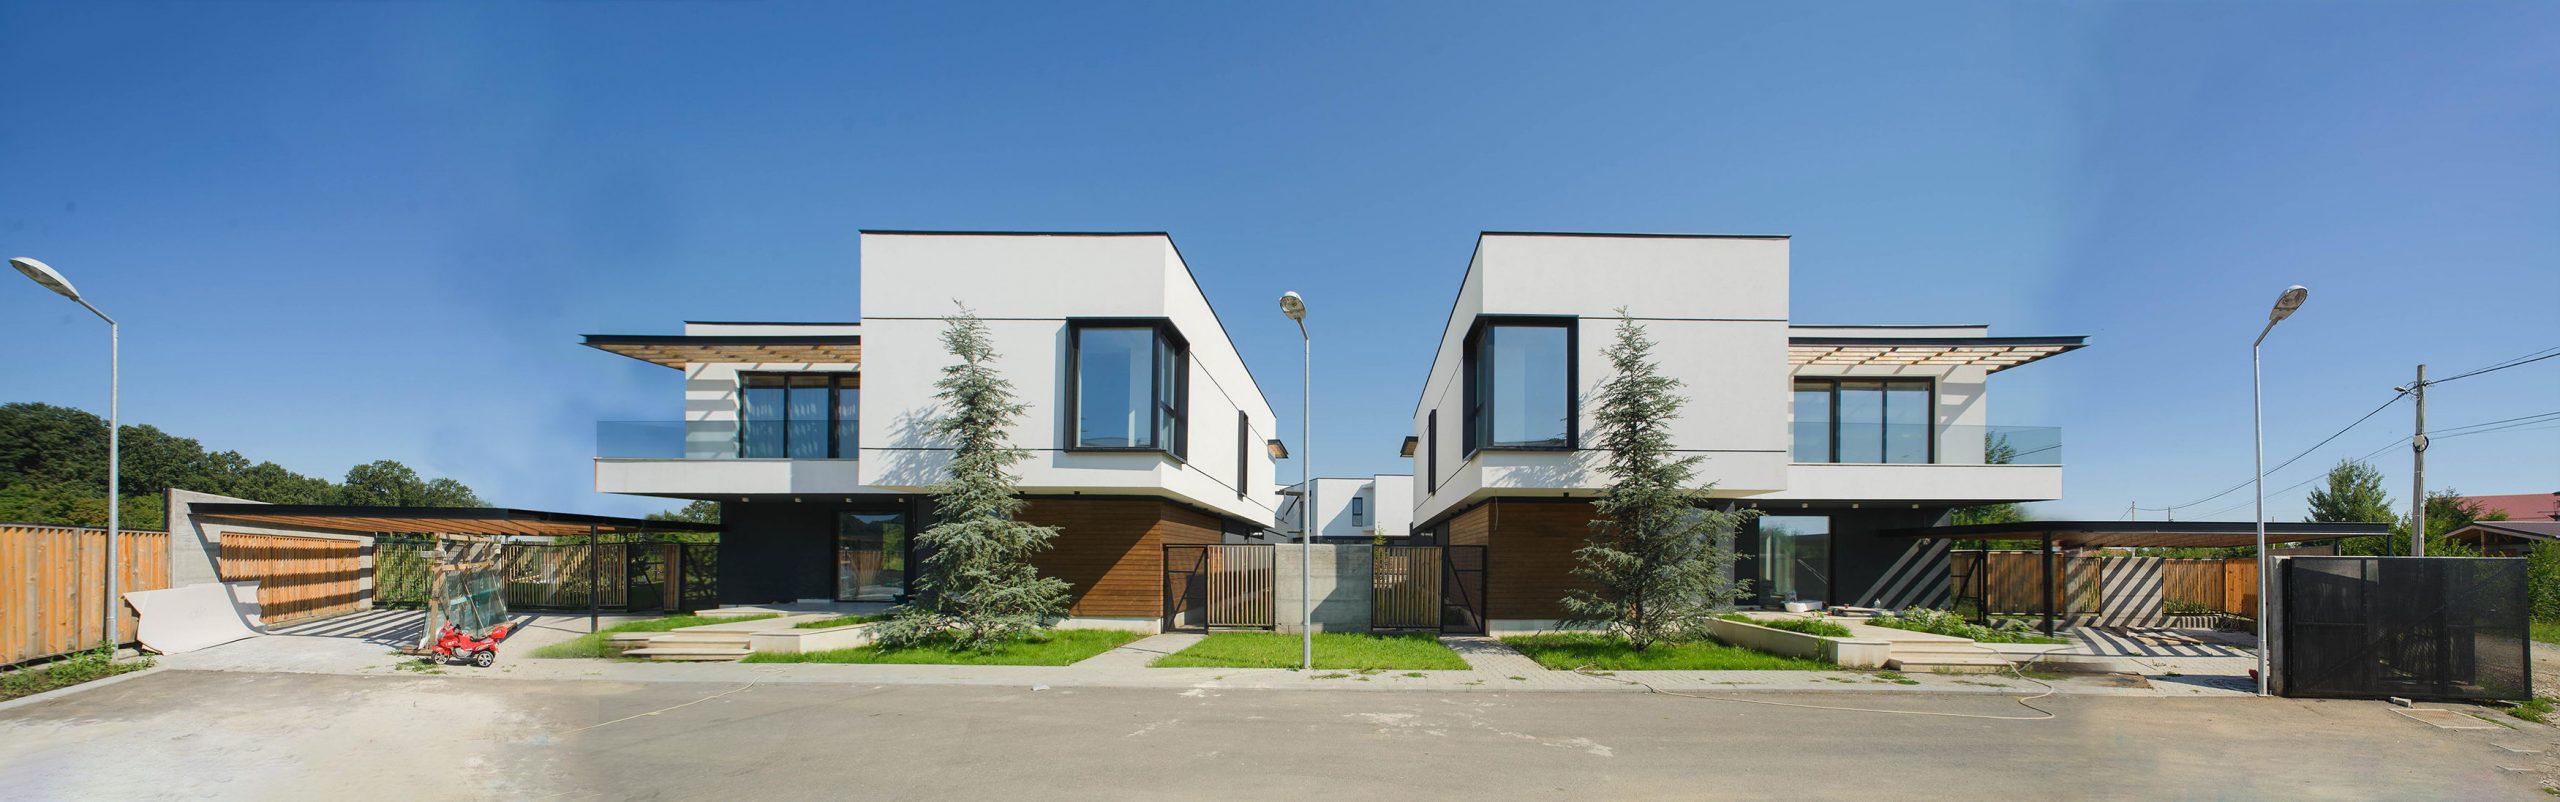 https://nbc-arhitect.ro/wp-content/uploads/2020/10/NBC-Arhitect-_-Arcstil_Residence-_-Romania-_-exterior-view_8-scaled.jpg